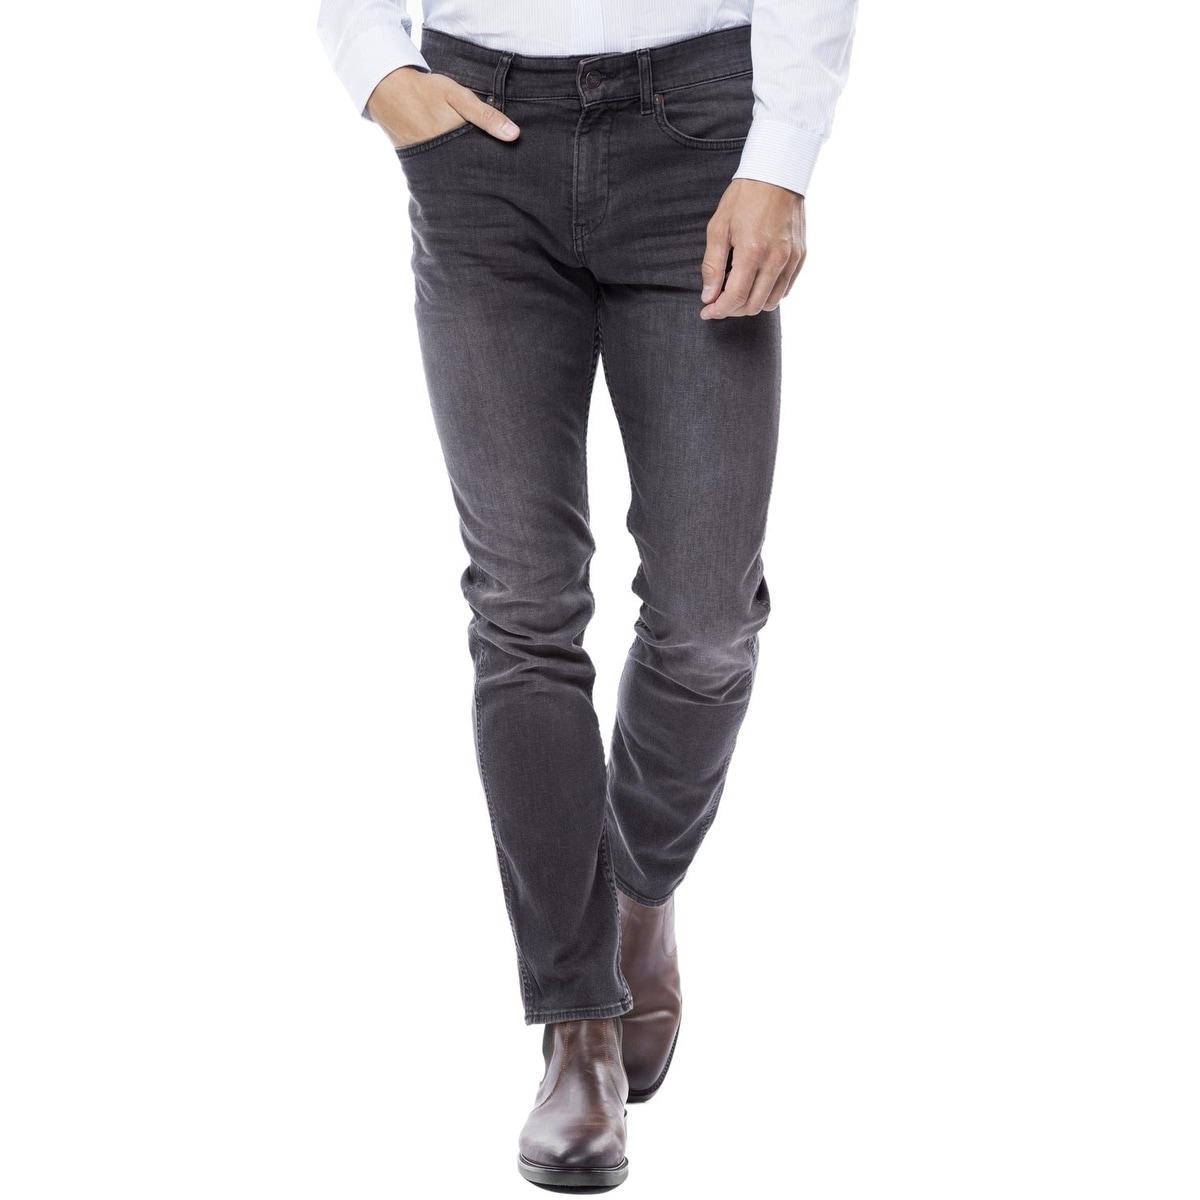 Hugo Boss Mens Delaware Slim Fit Stretch Jeans